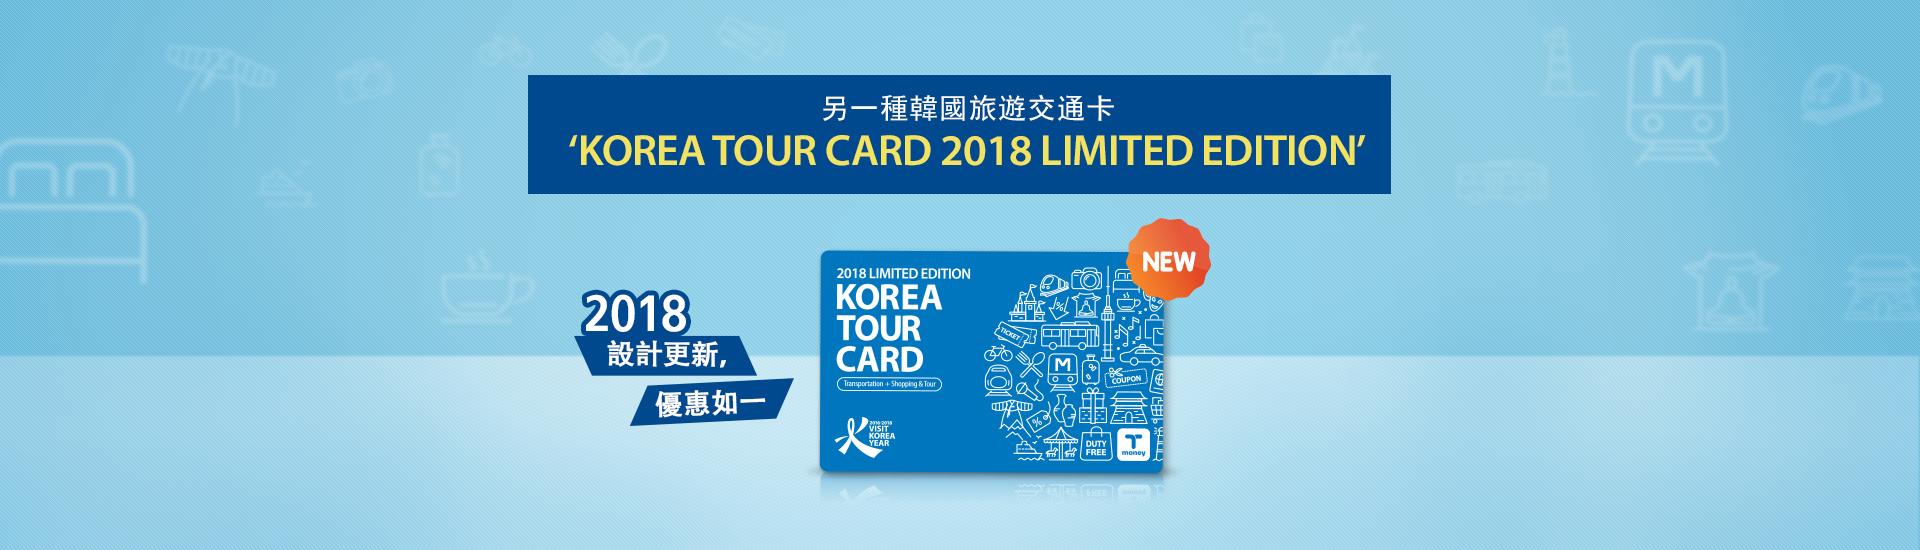 KOREA TOUR CARD 2018 LIMITED EDITION